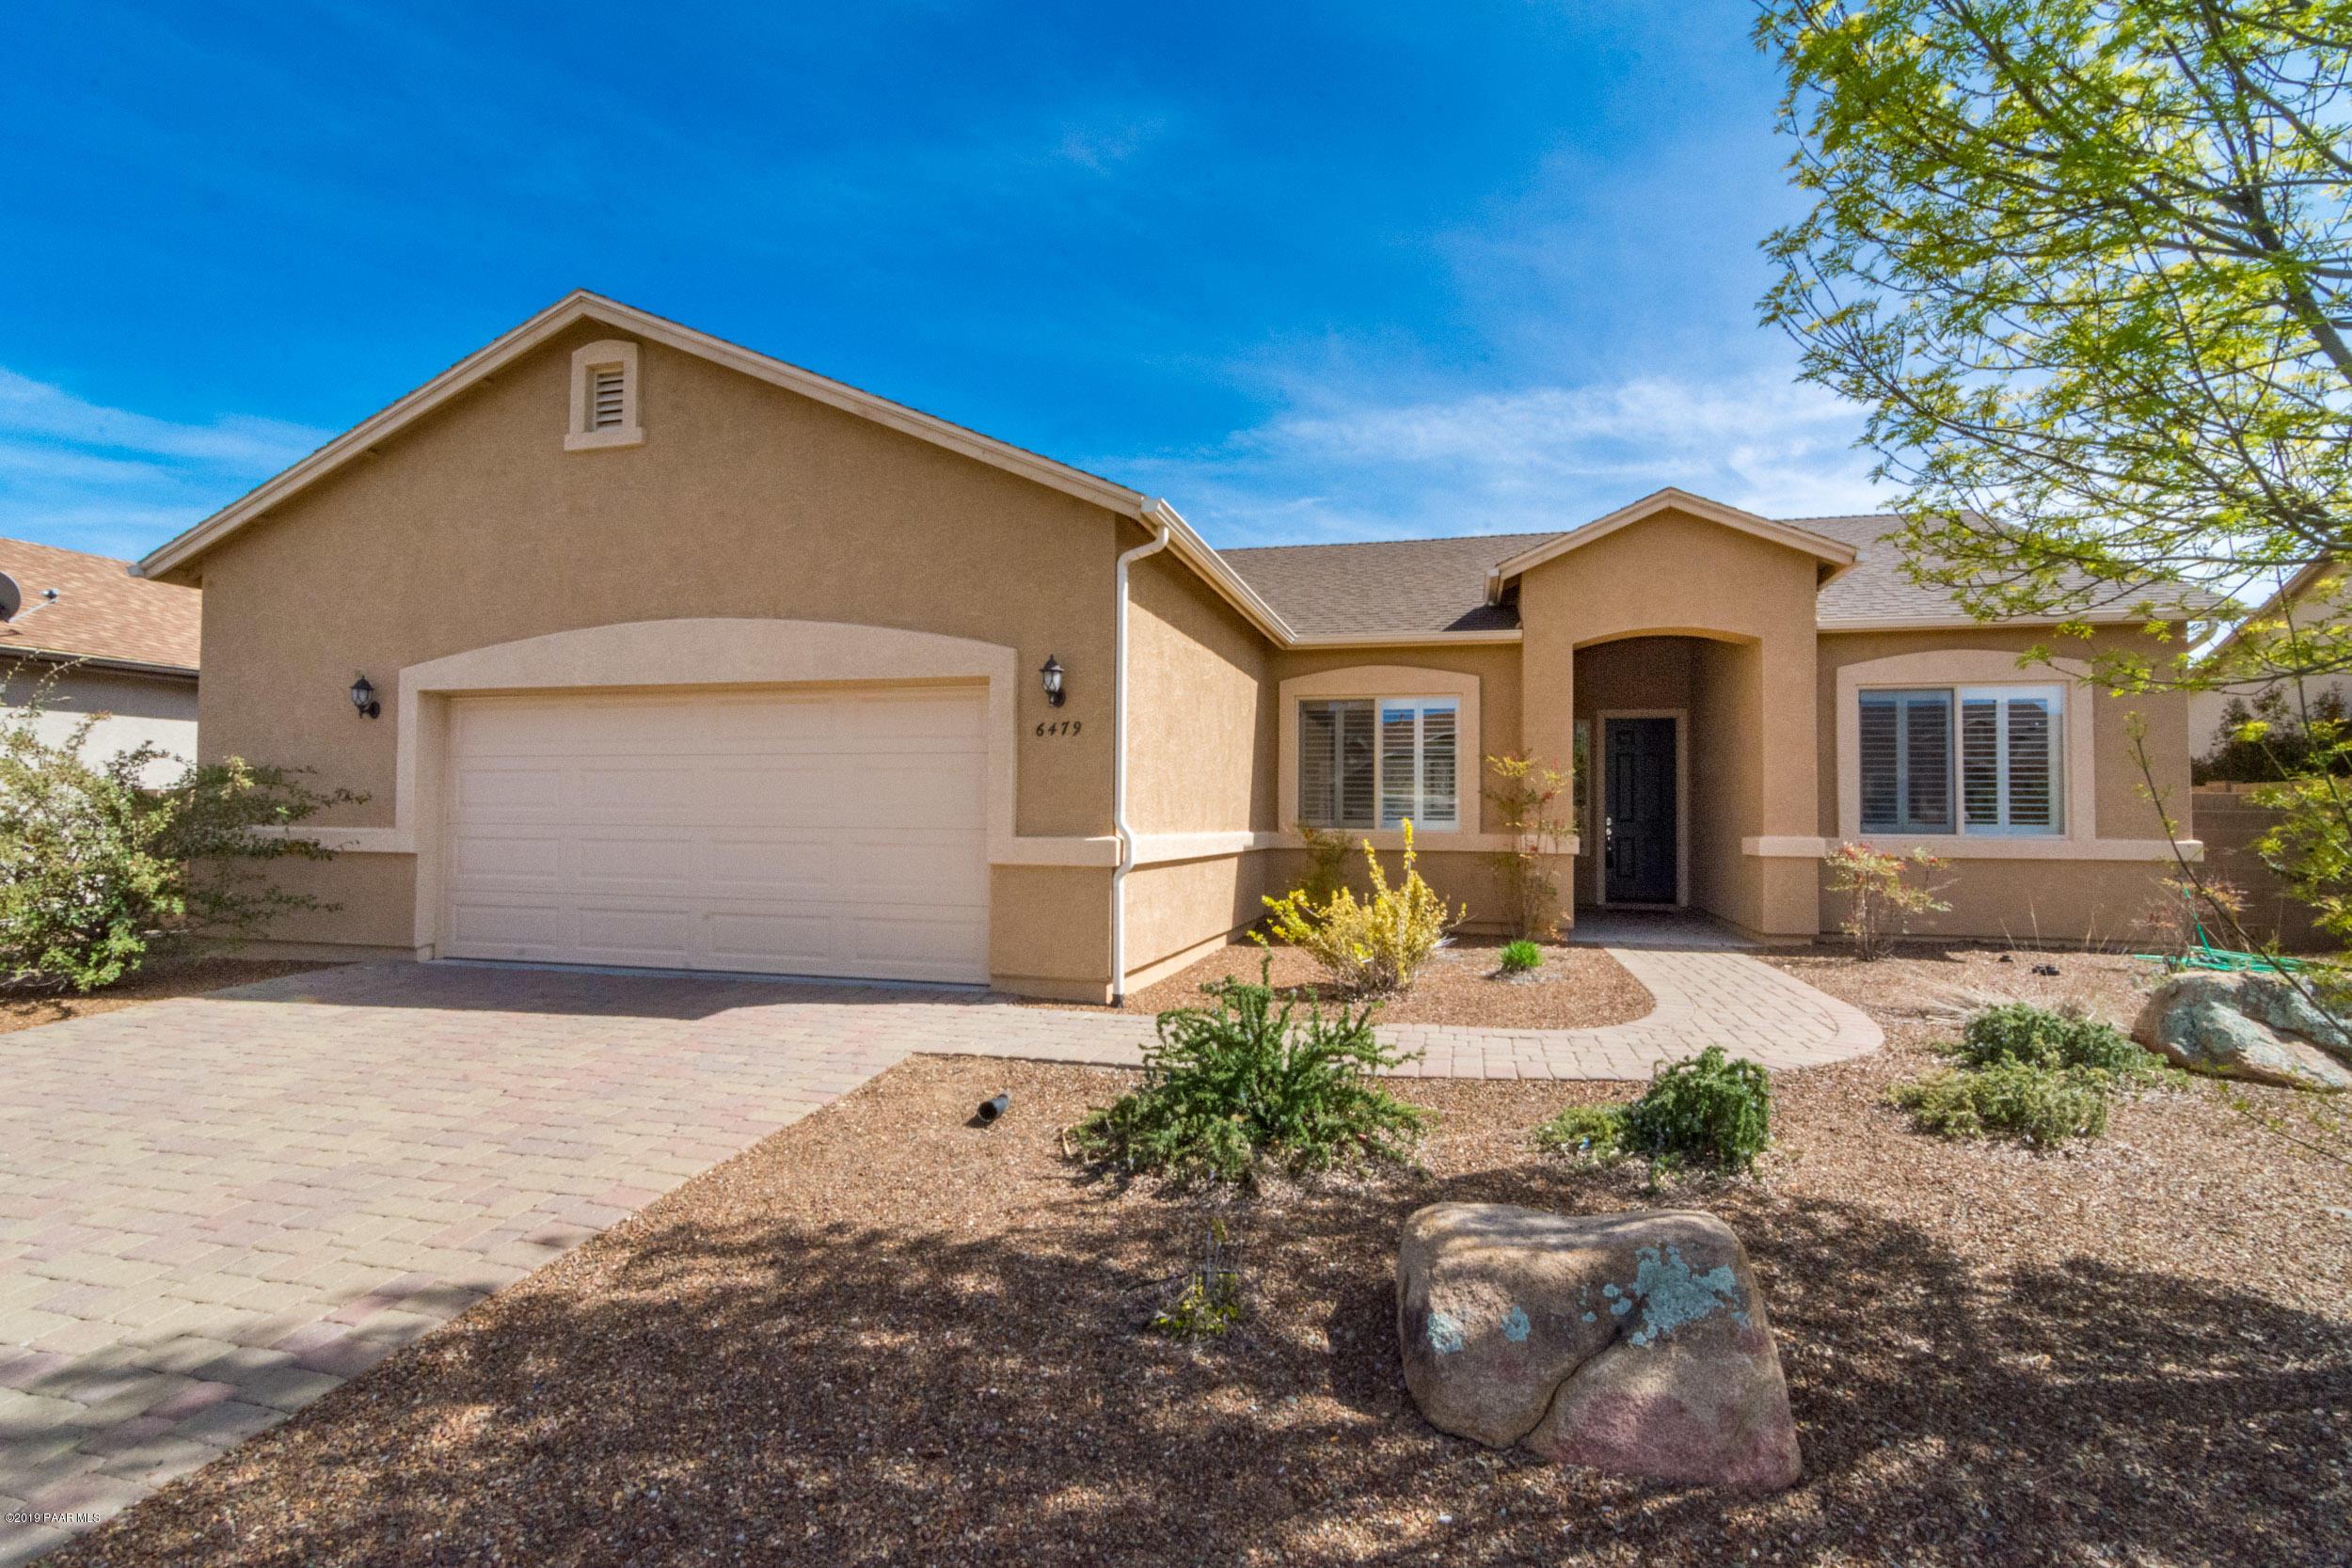 Photo of 6479 Deacon, Prescott Valley, AZ 86314